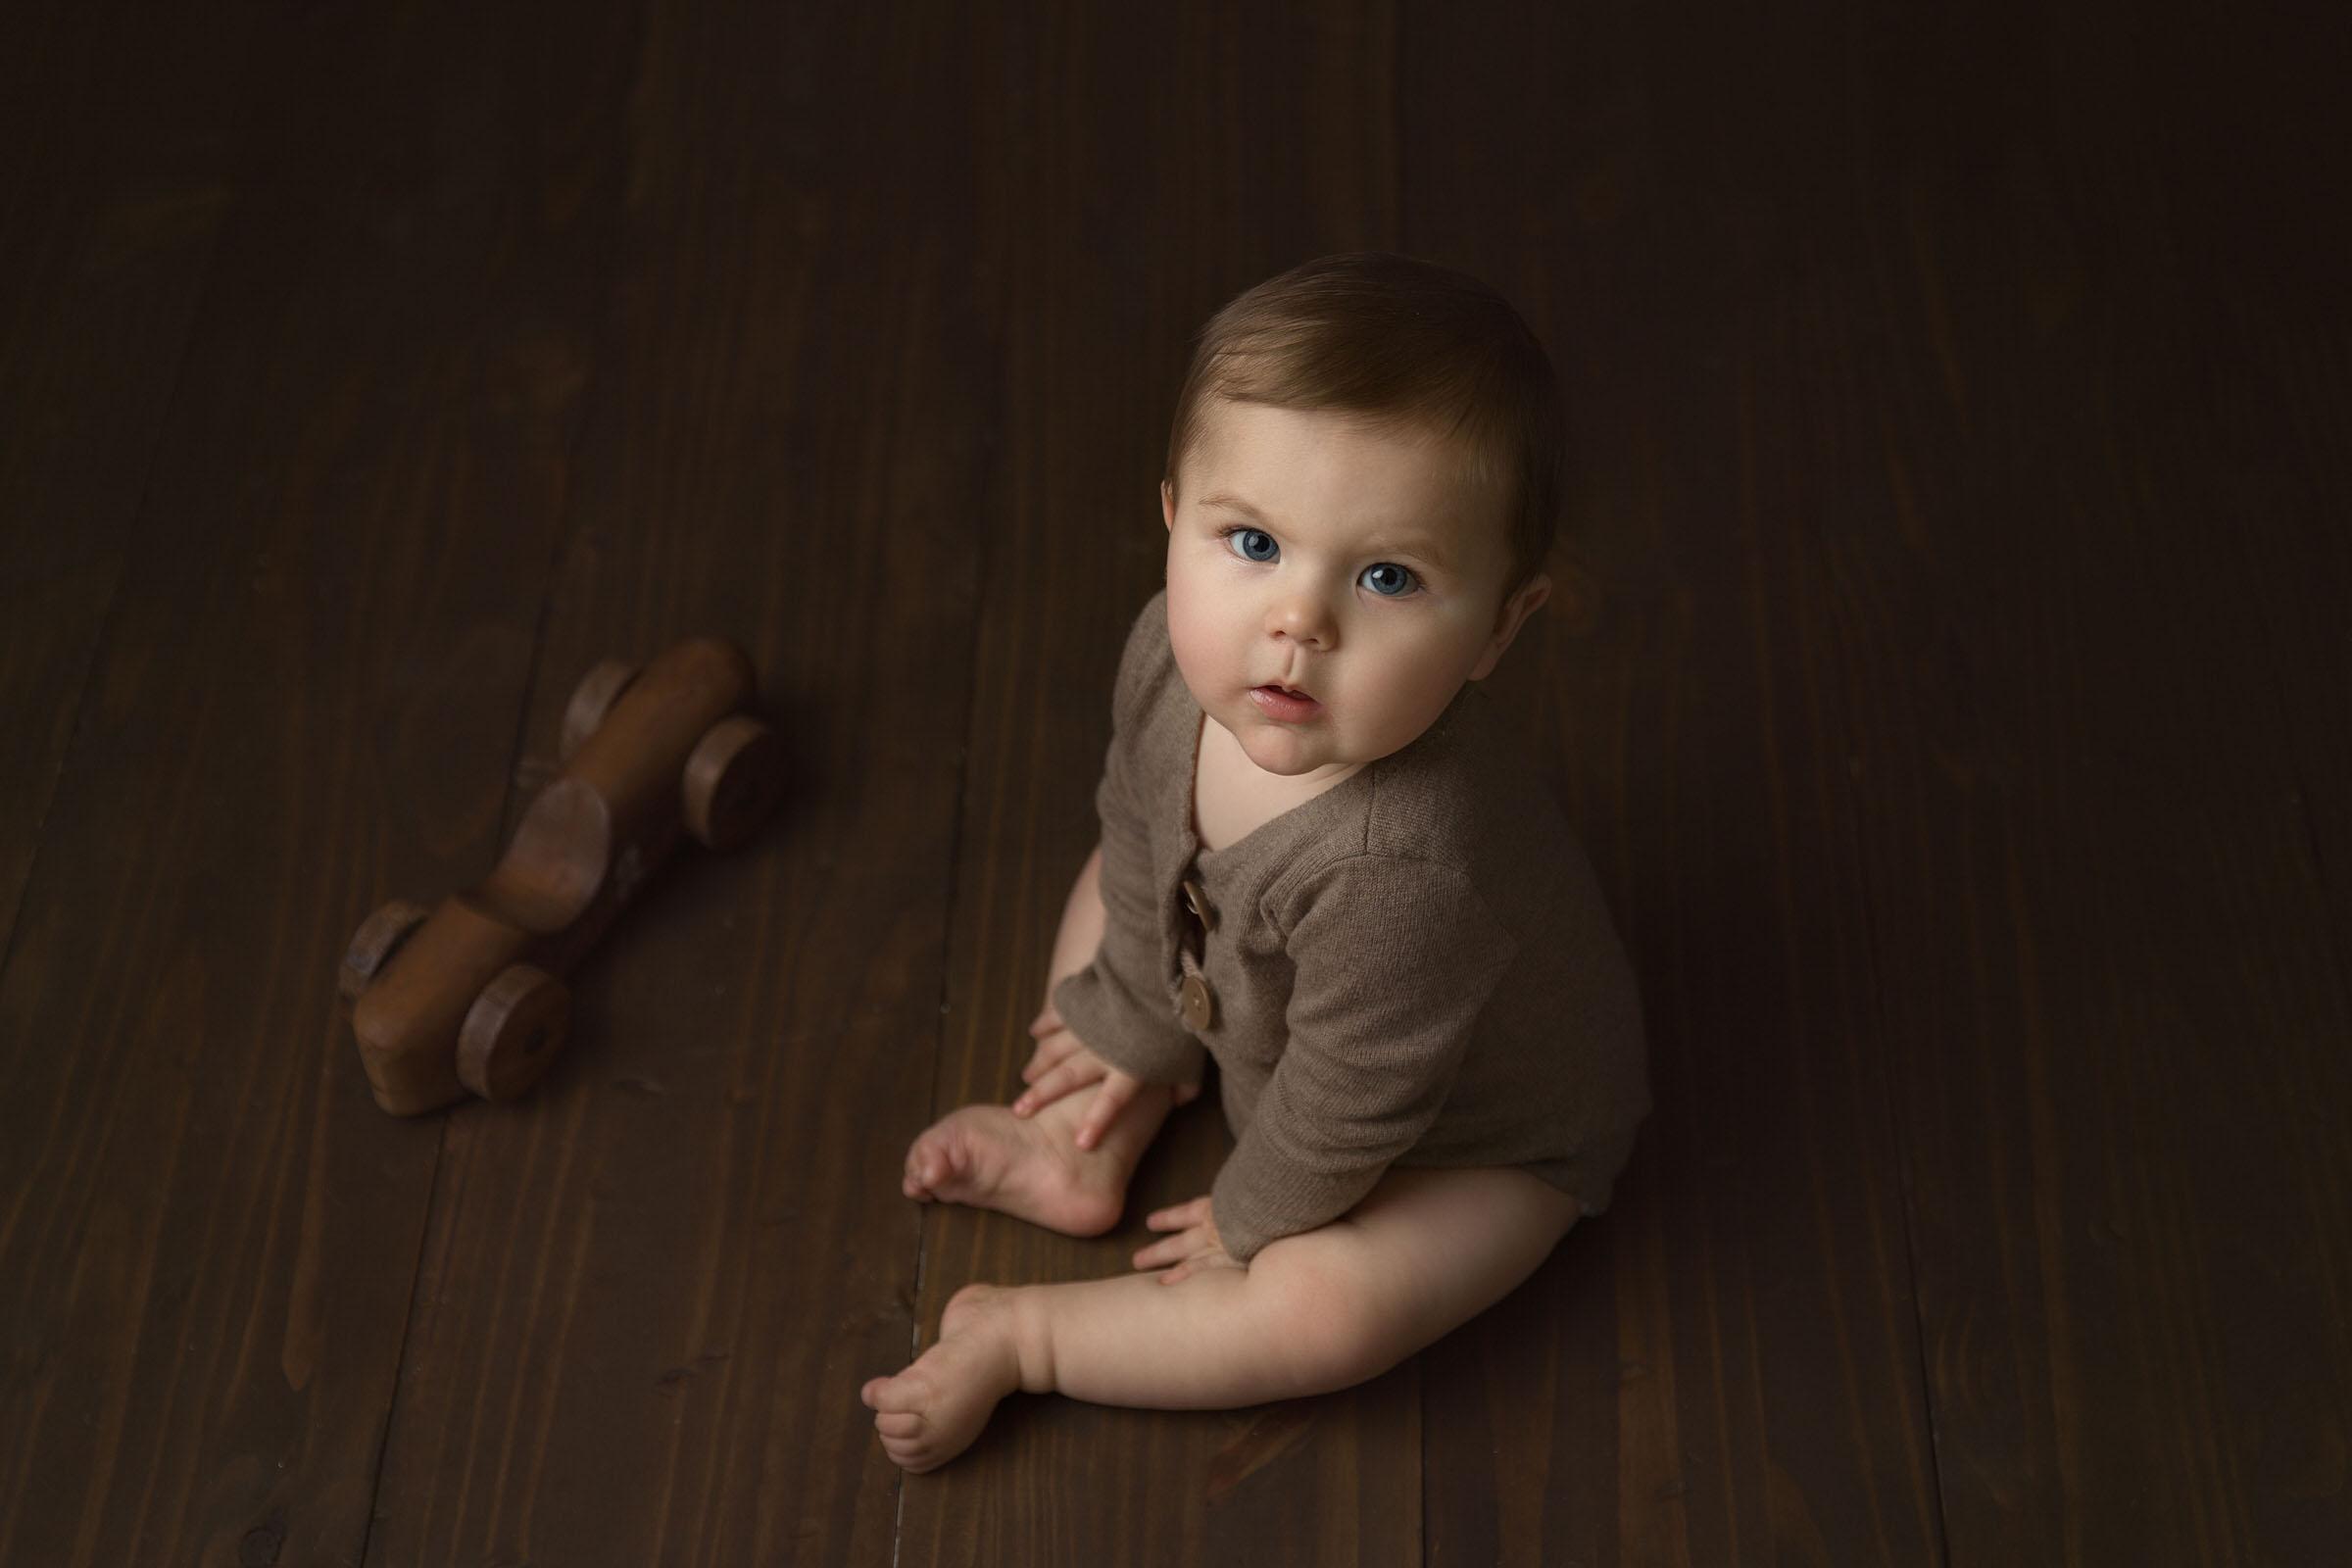 Baby photographer in Essex